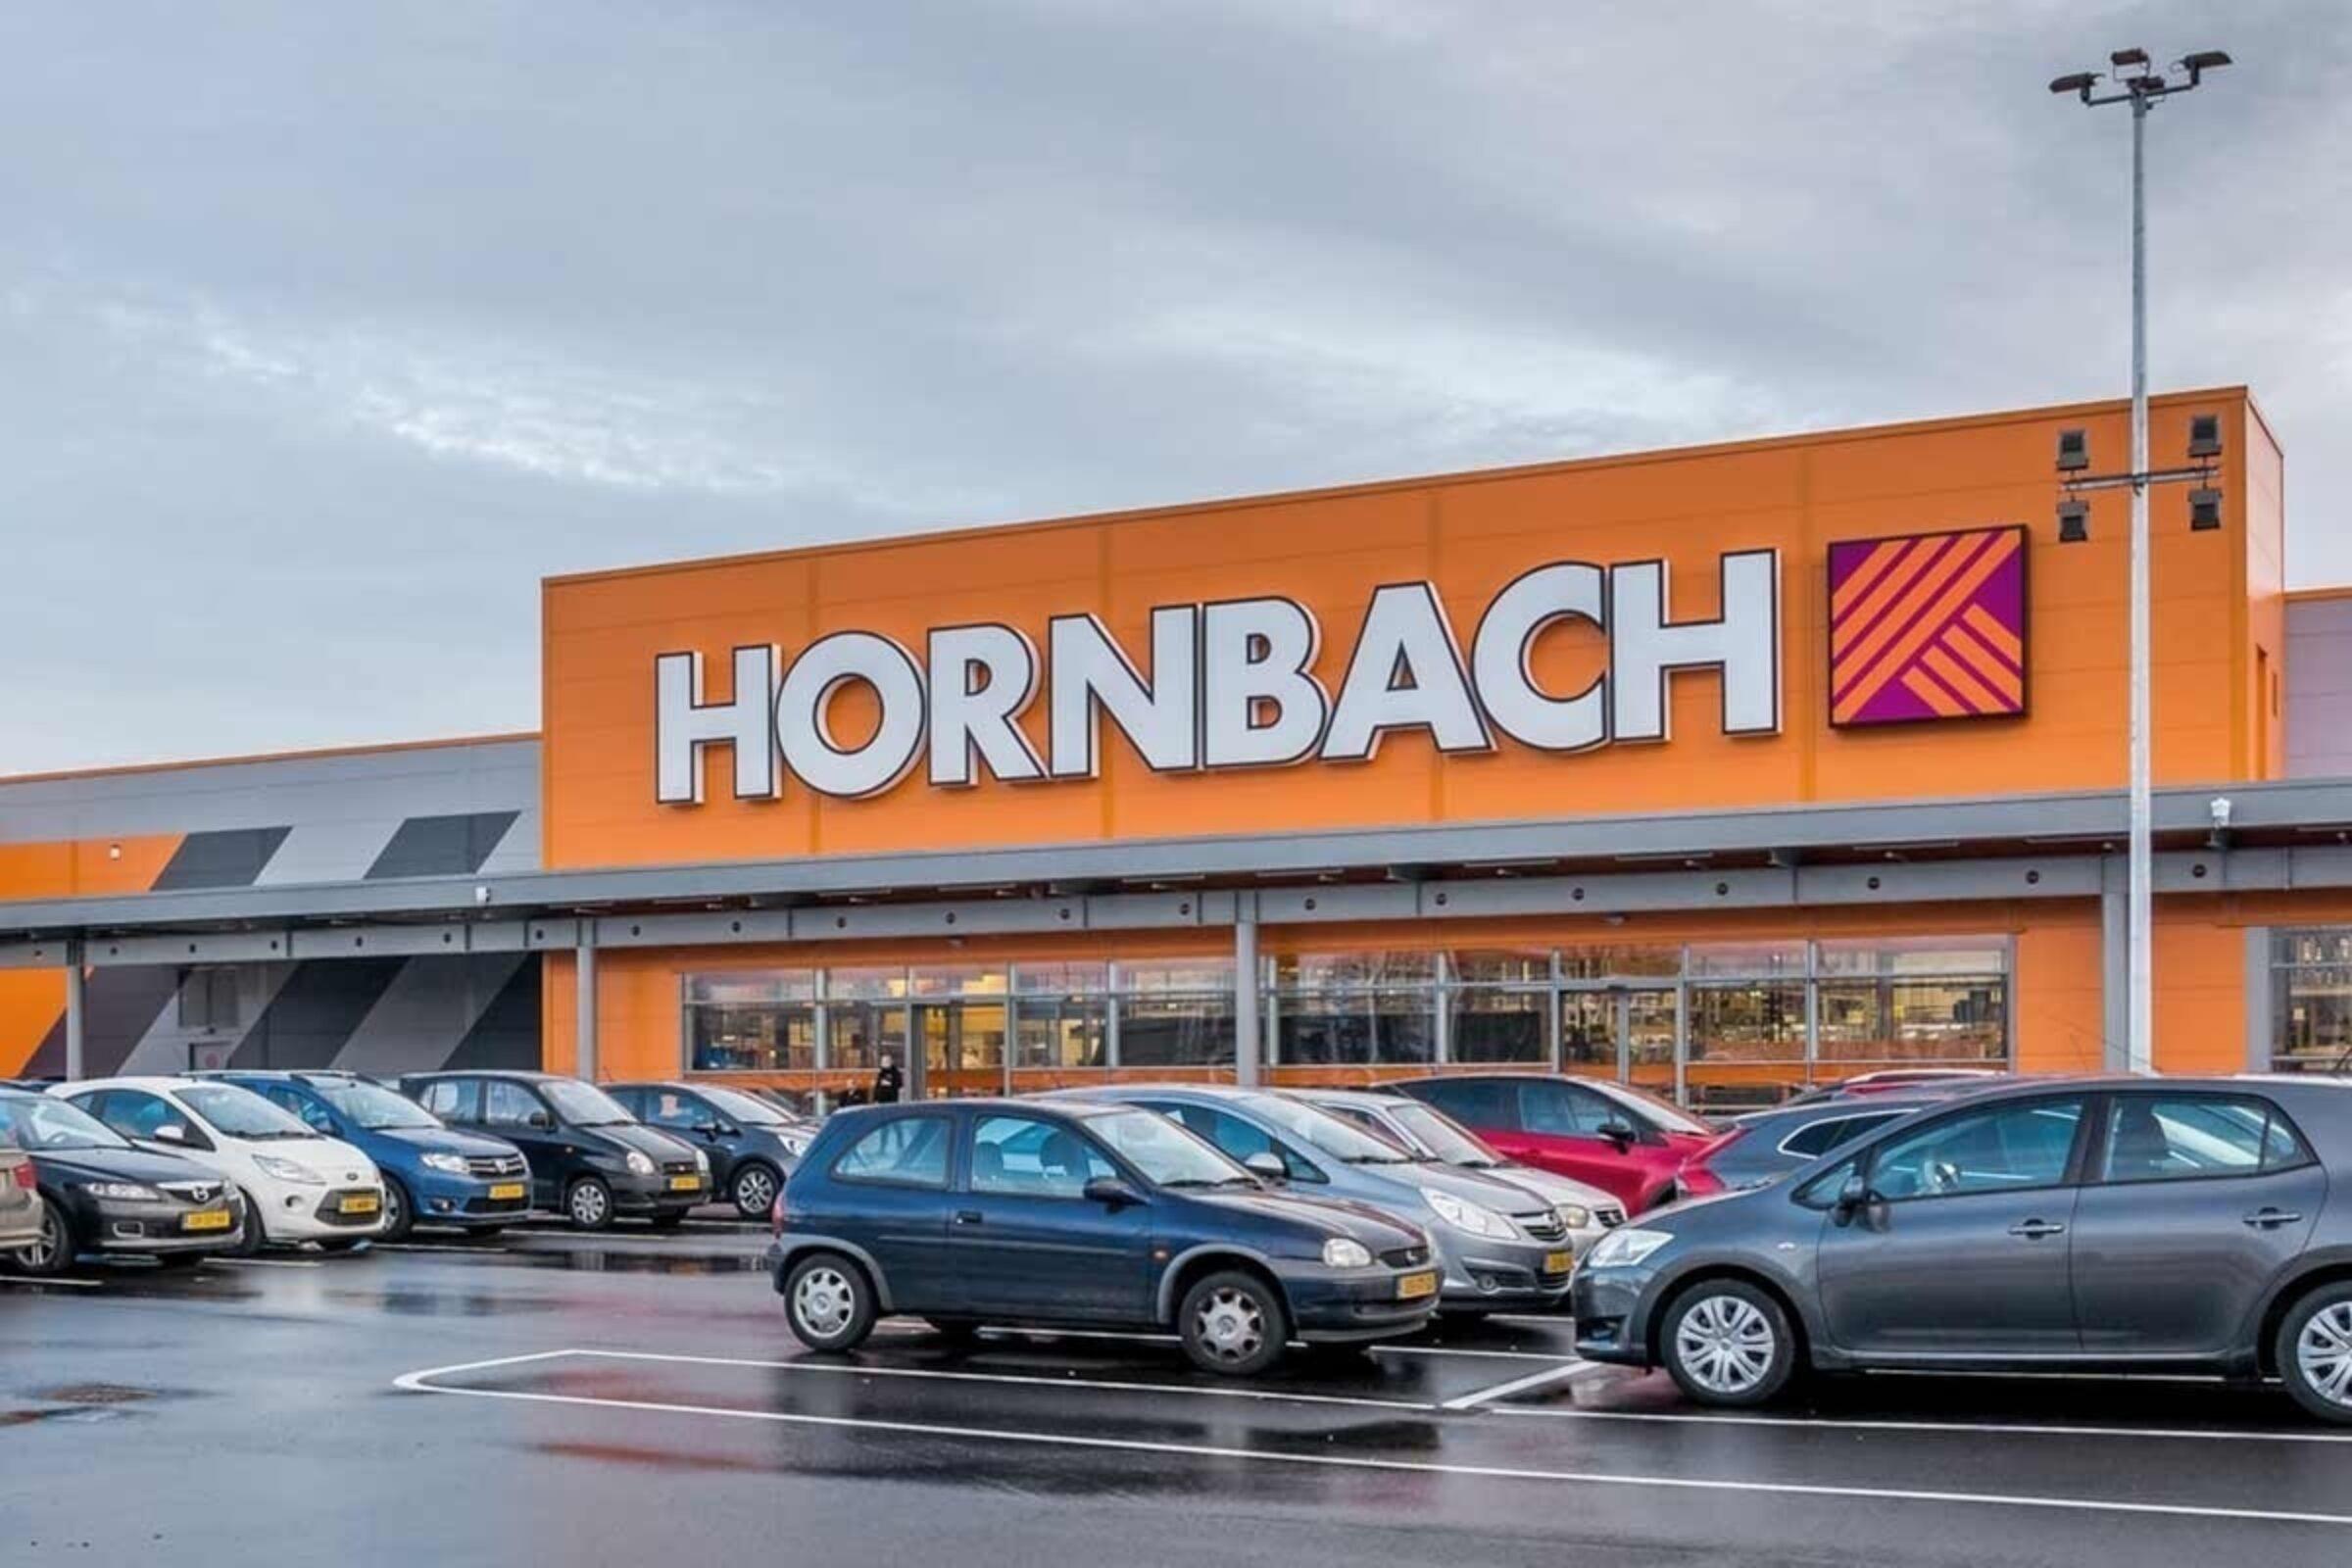 Hornbach Enschede